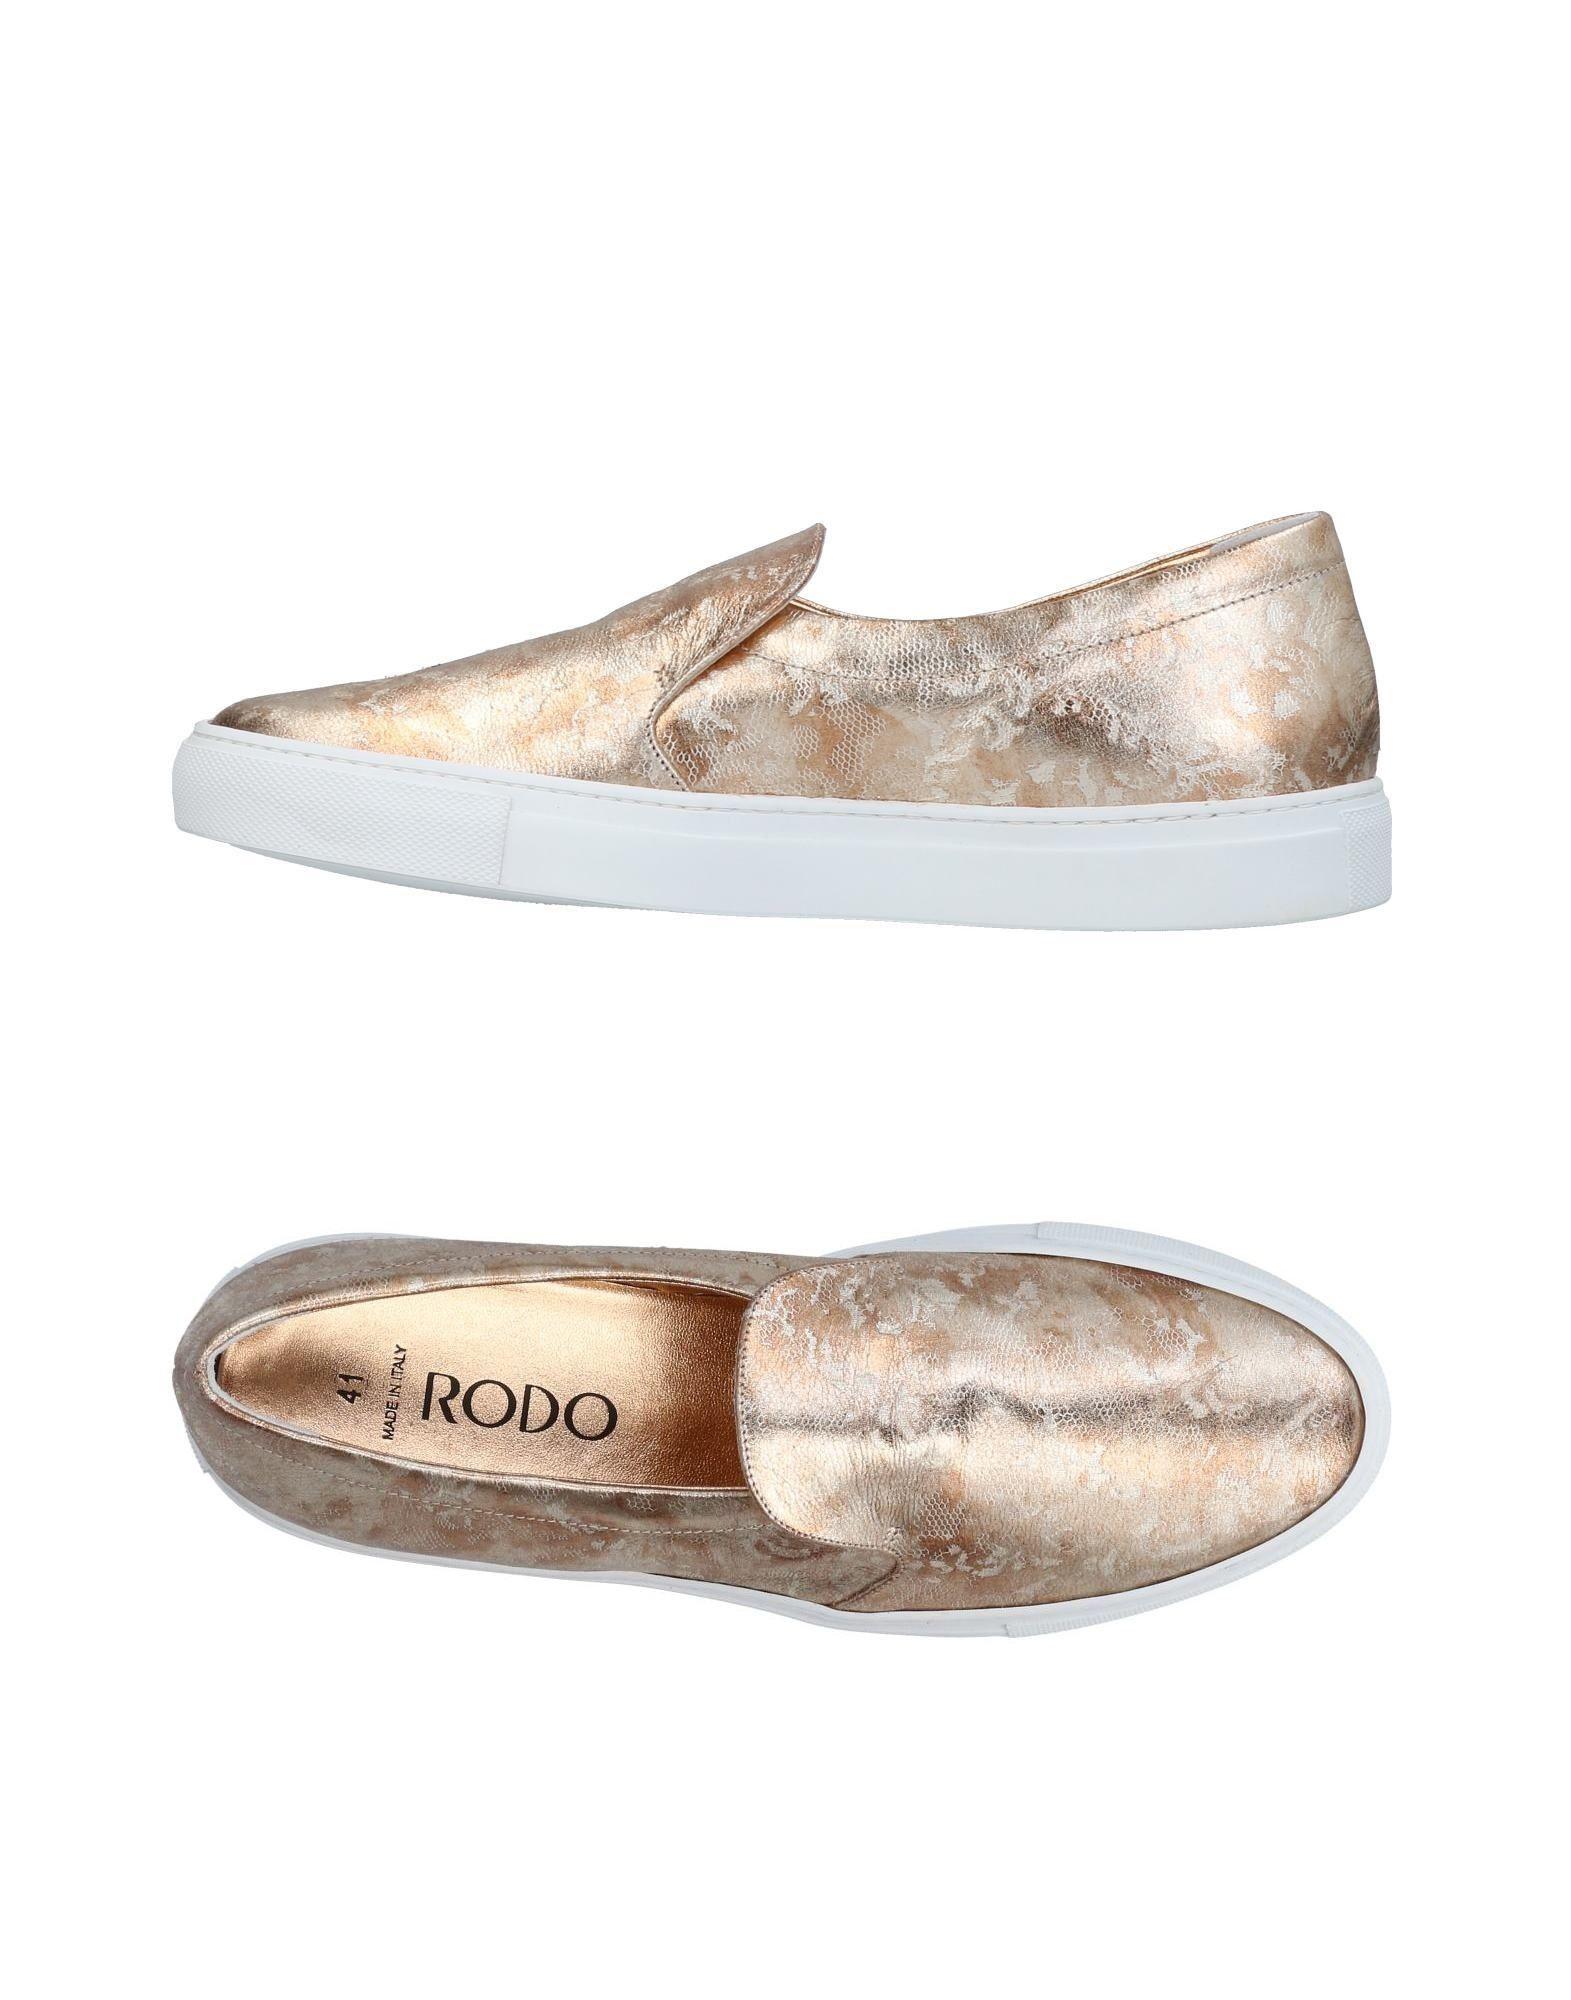 Moda Sneakers Rodo Donna - 11454604BT